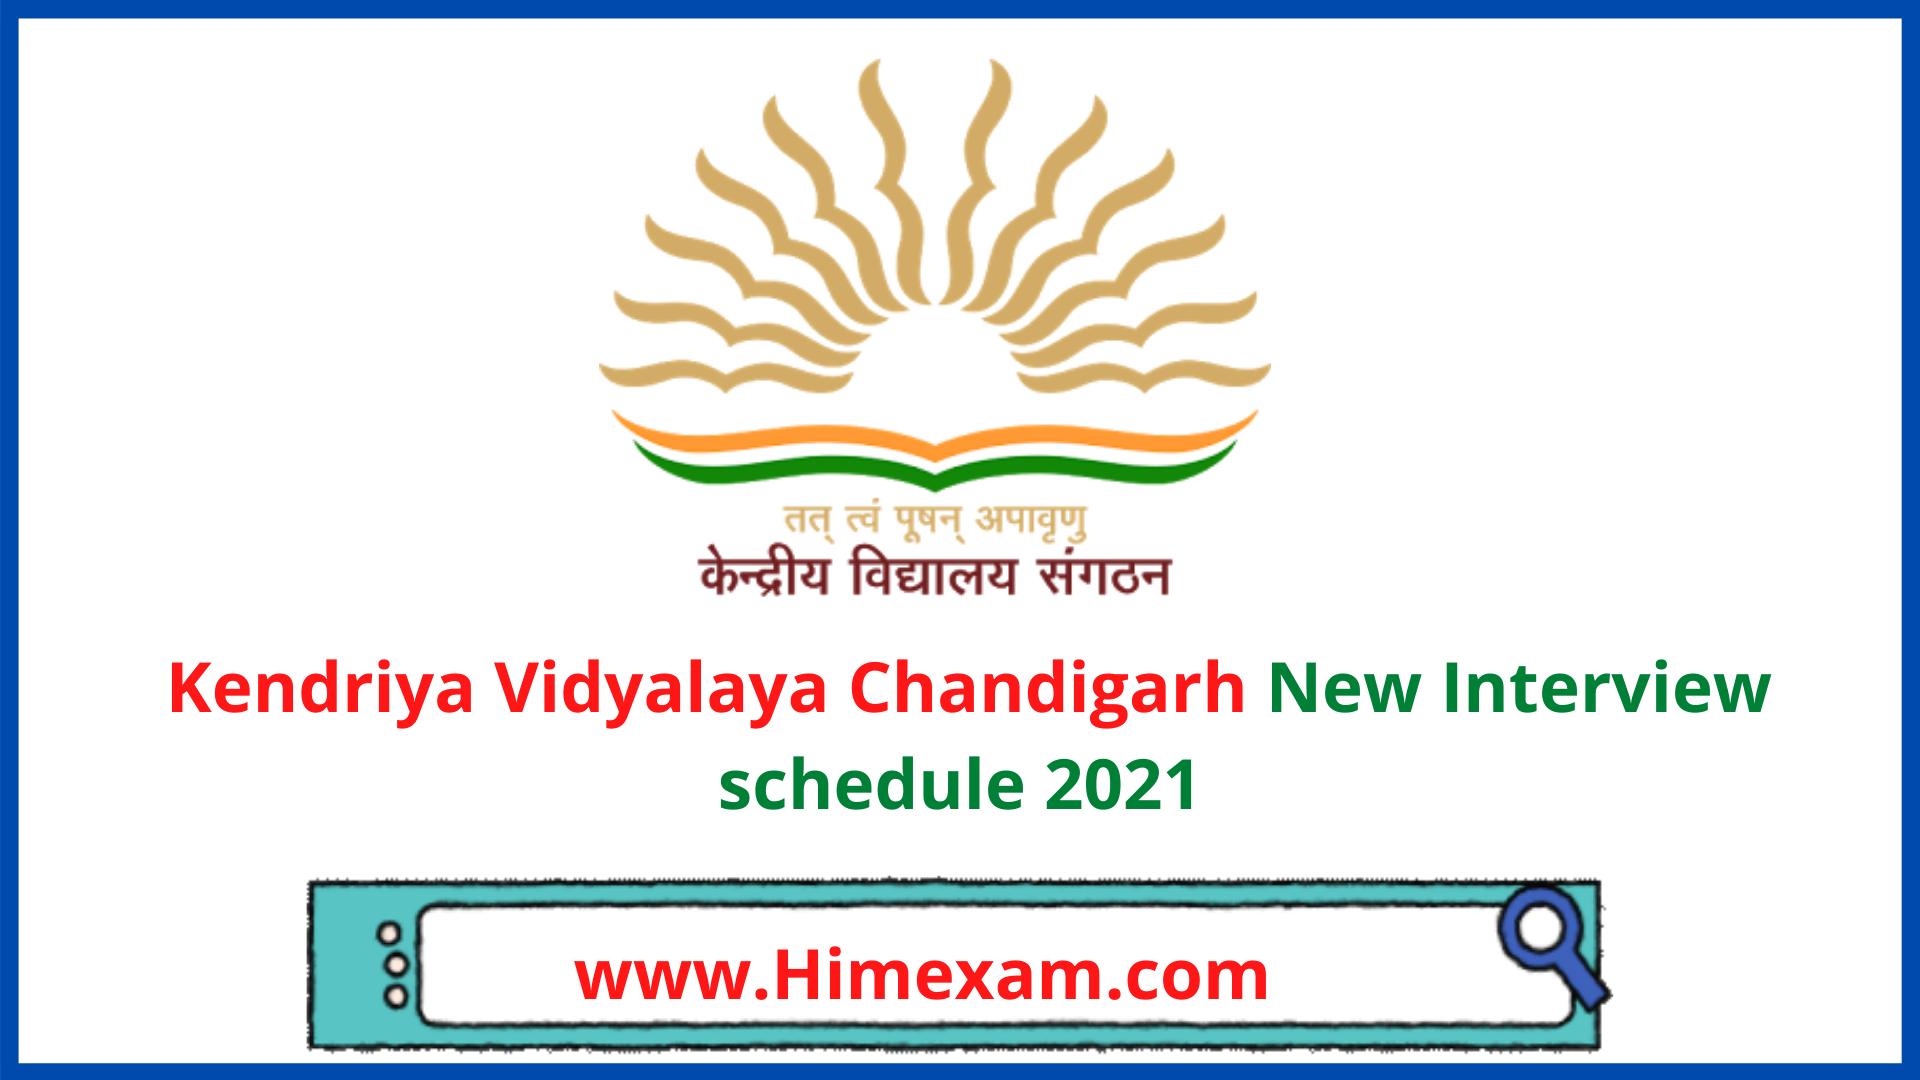 Kendriya Vidyalaya Chandigarh New Interview schedule 2021